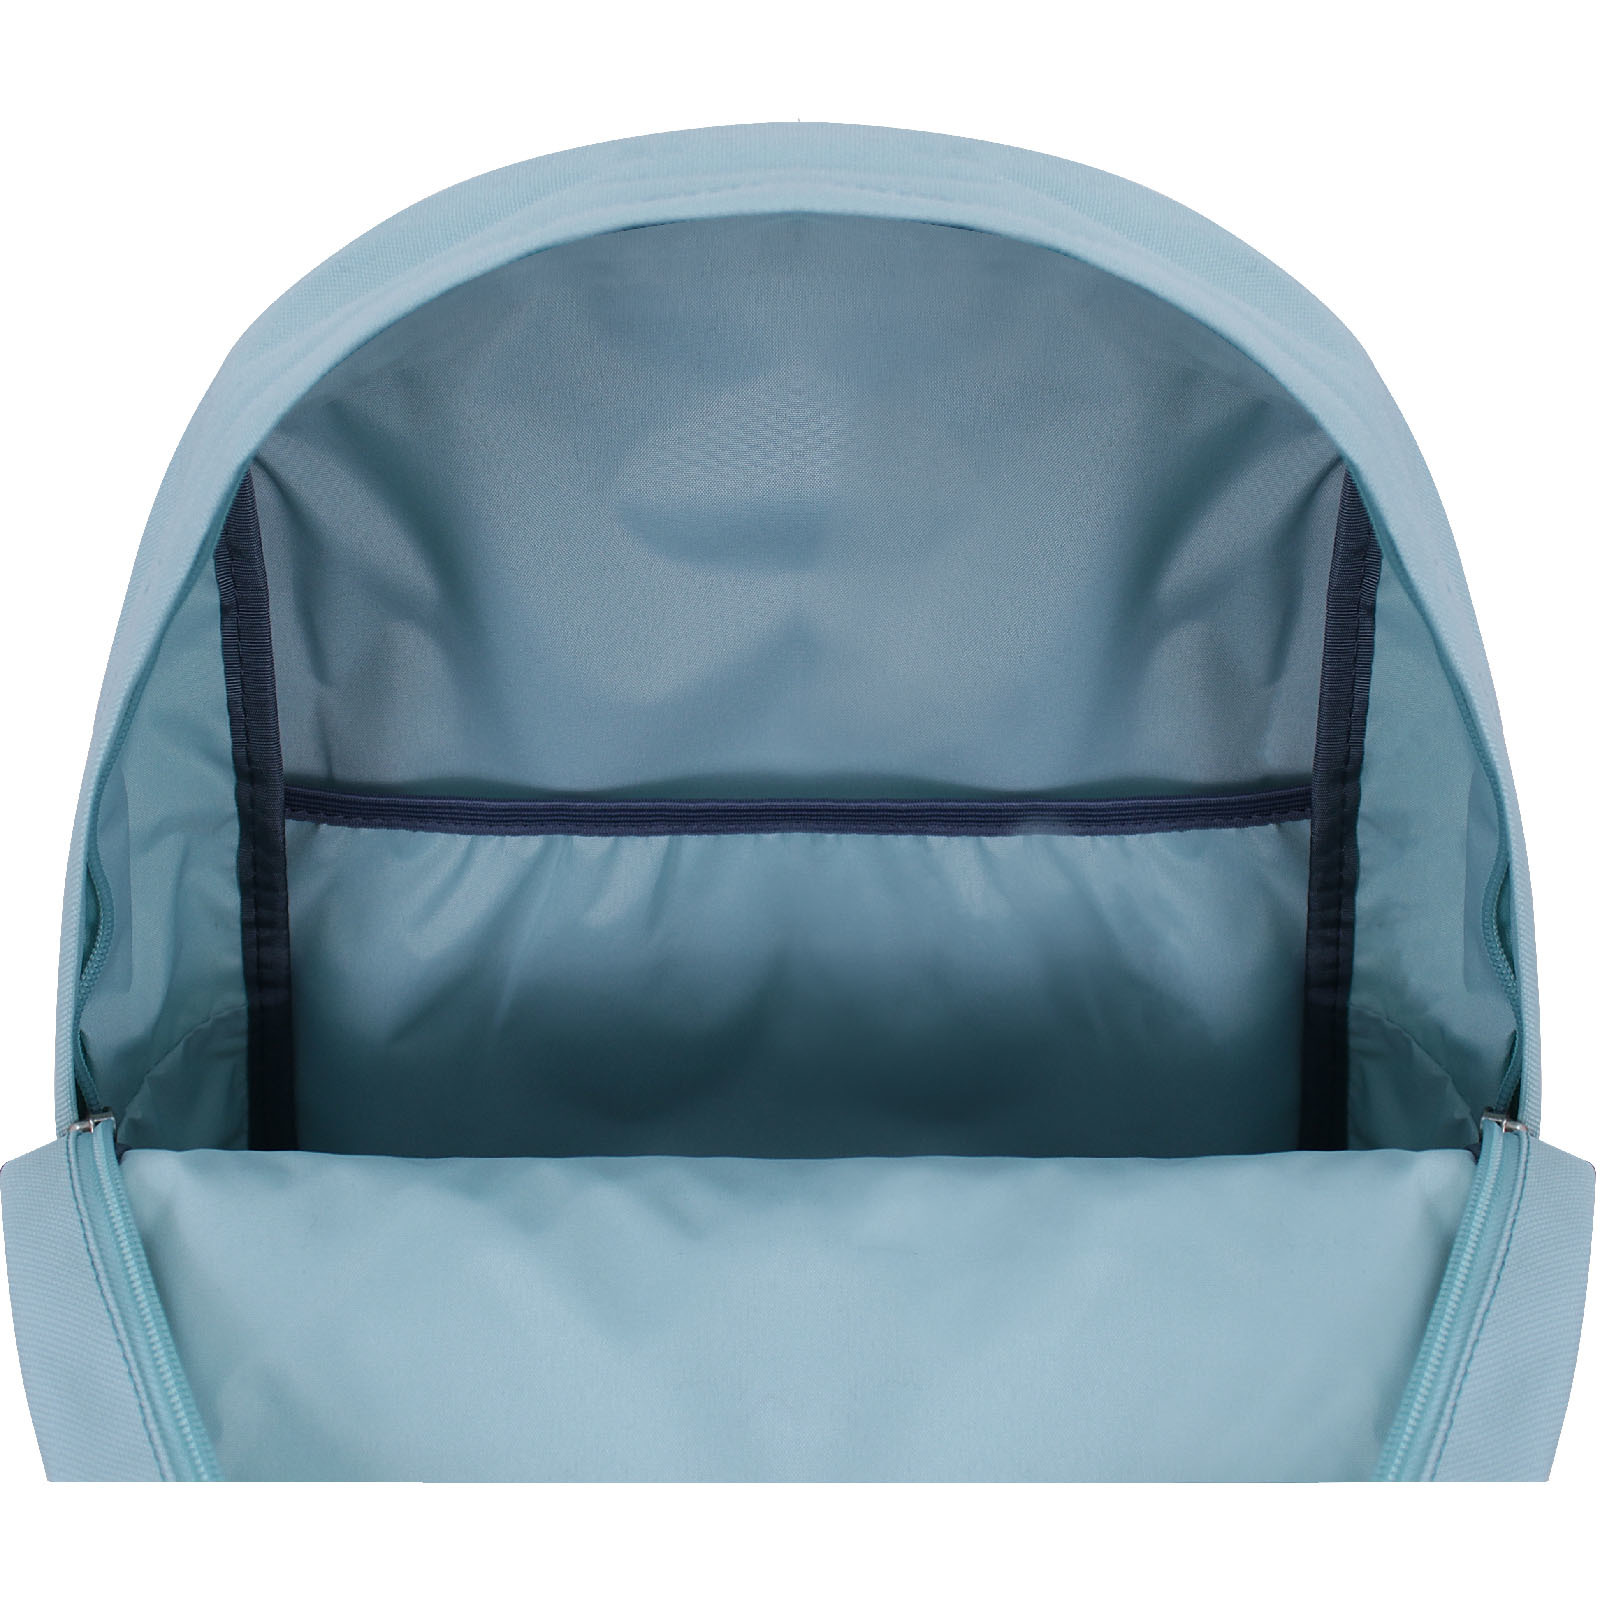 Рюкзак Bagland Молодежный W/R 17 л. тиффани 979 (00533662)